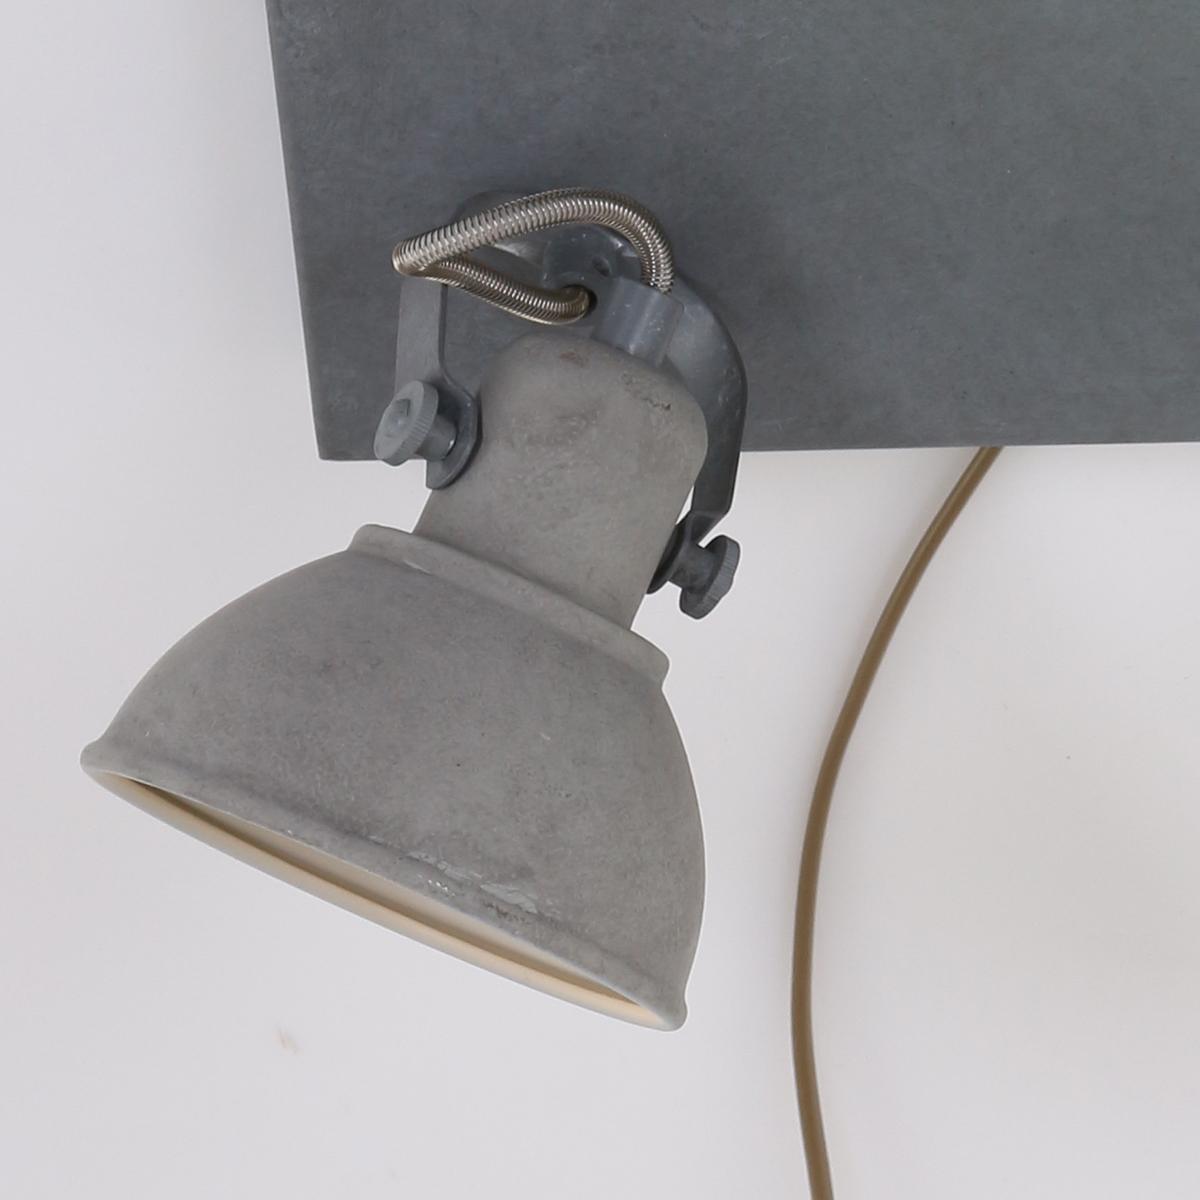 verstellbare deckenleuchte beon betongrau fabriklampe online. Black Bedroom Furniture Sets. Home Design Ideas